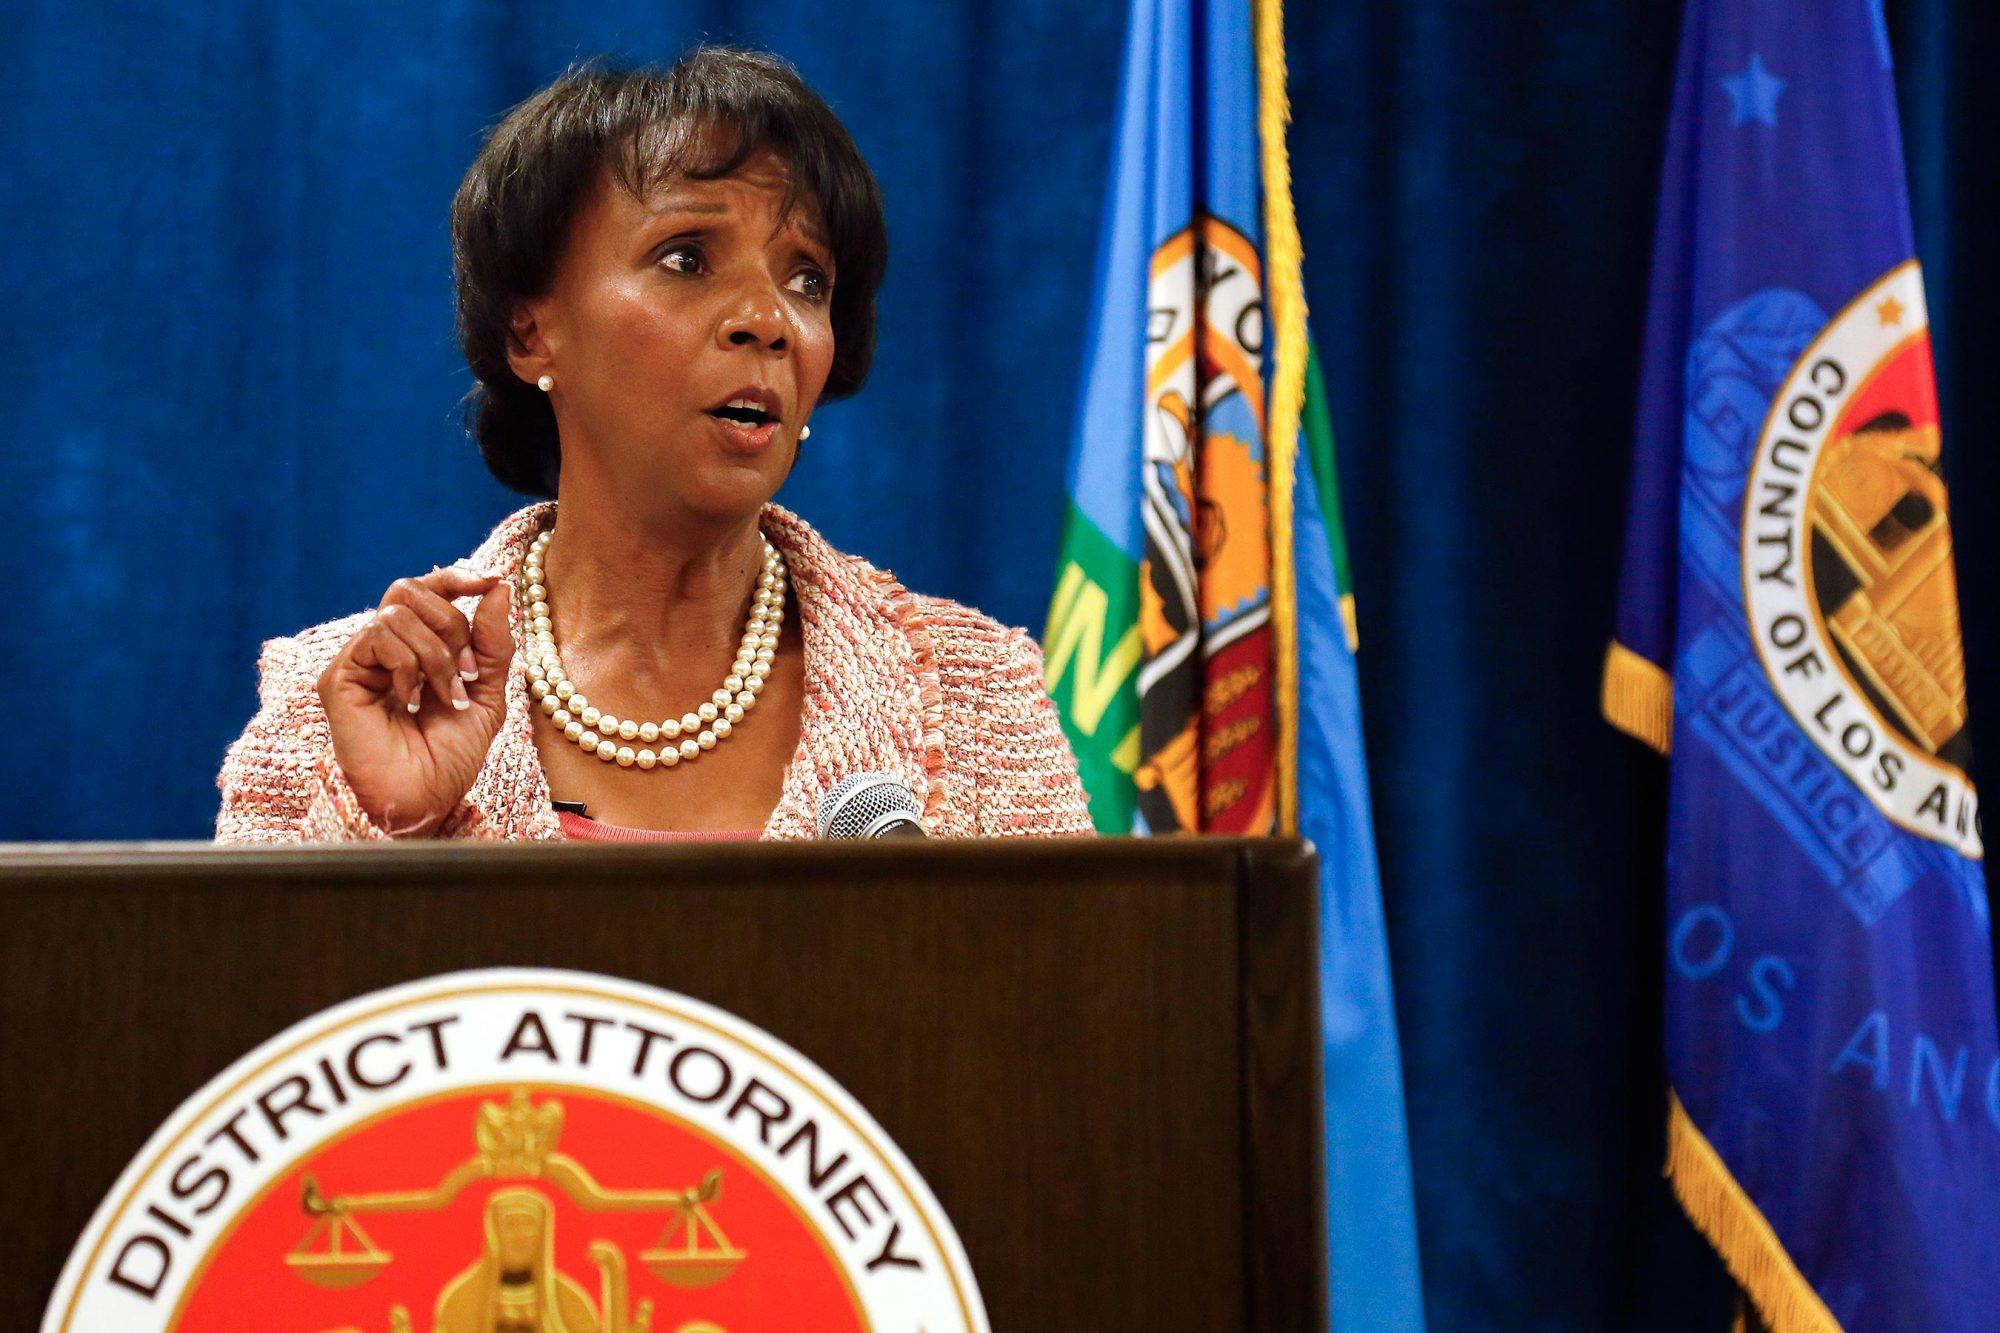 Los Angeles DA Announces Wrongful Convictions Review Unit